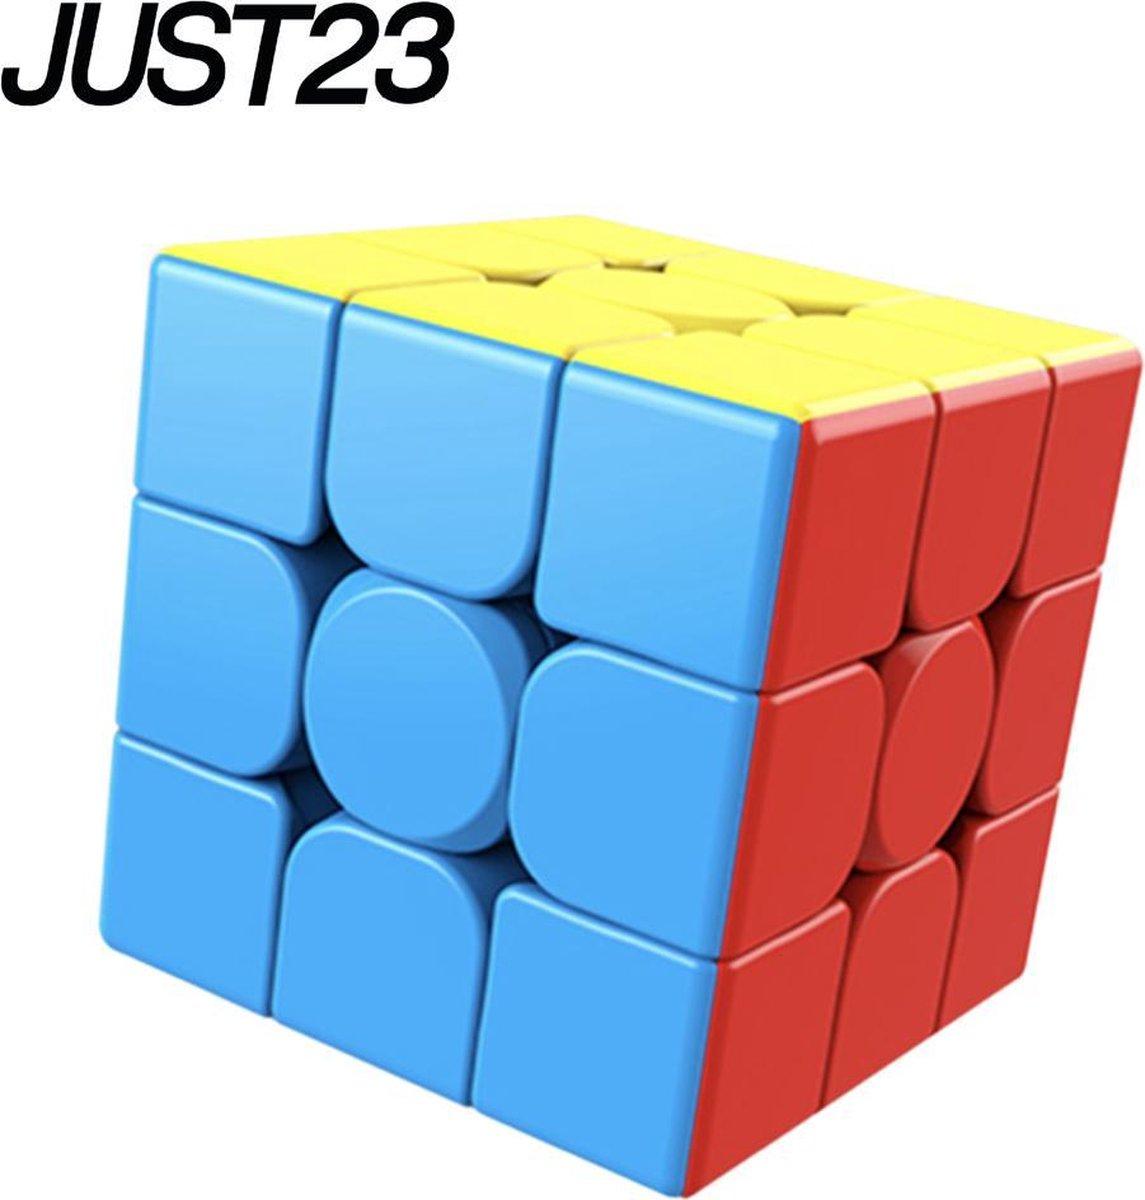 JUST23 MoYu Speed Cube 3x3 - Magic cube - Verstelbaar - Puzzelkubus